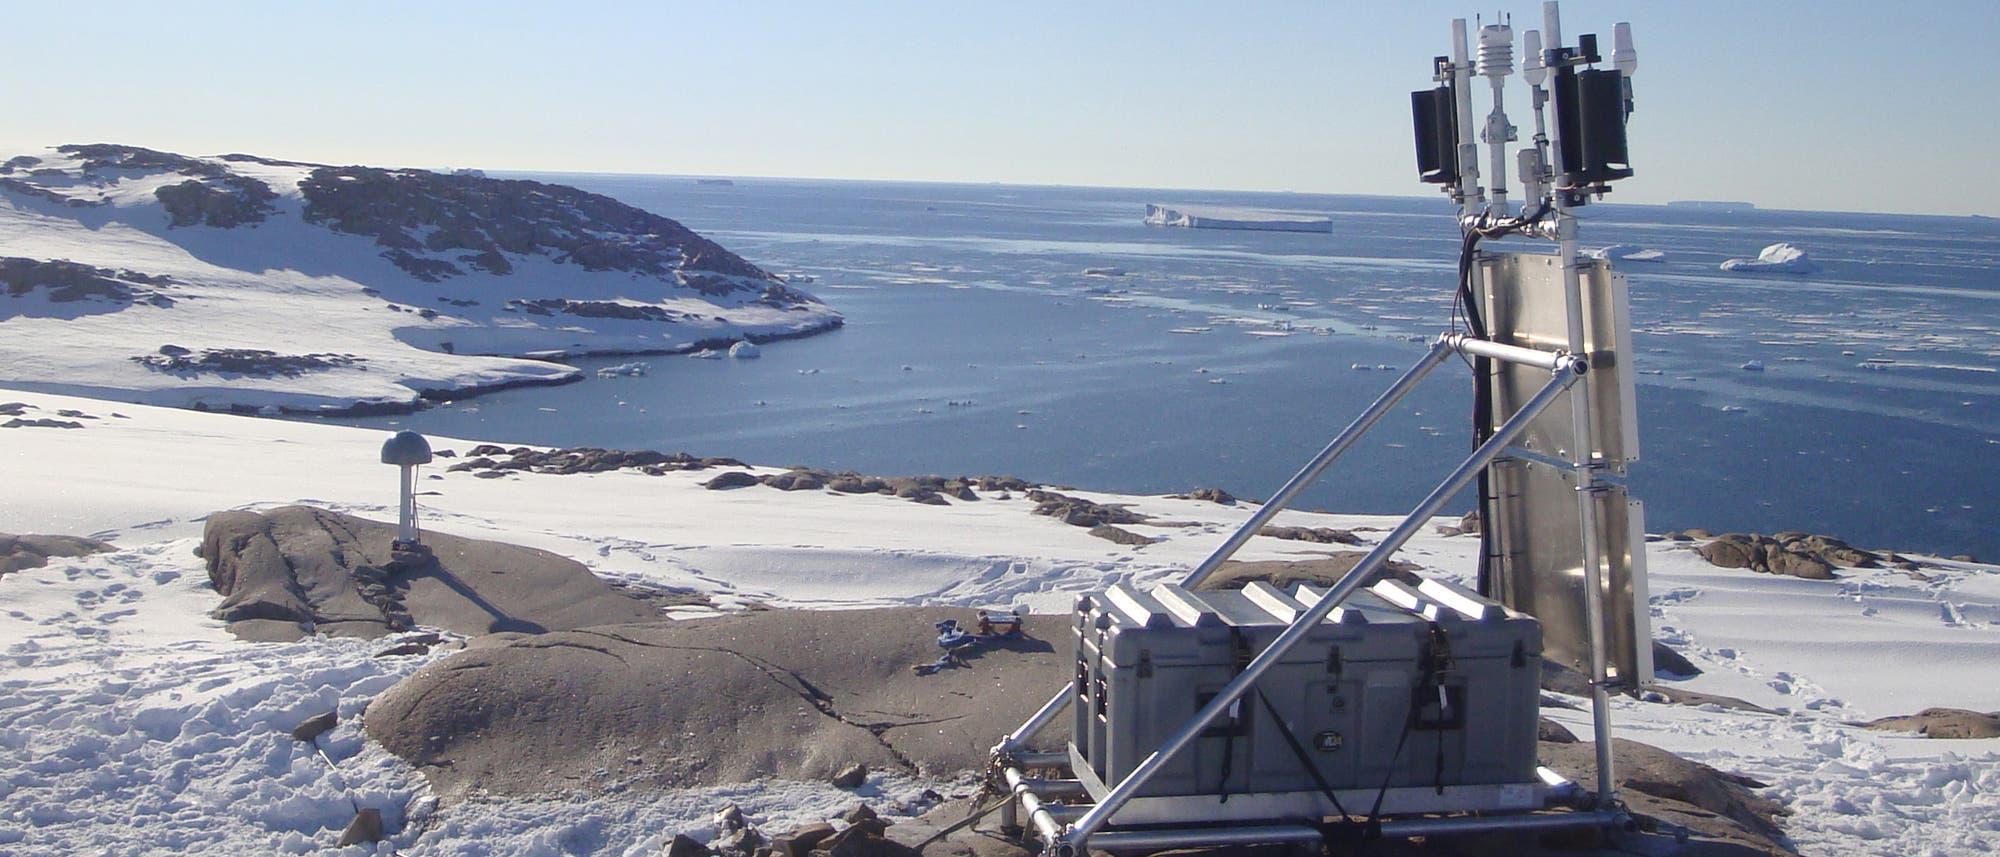 Messstation in der Antarktis